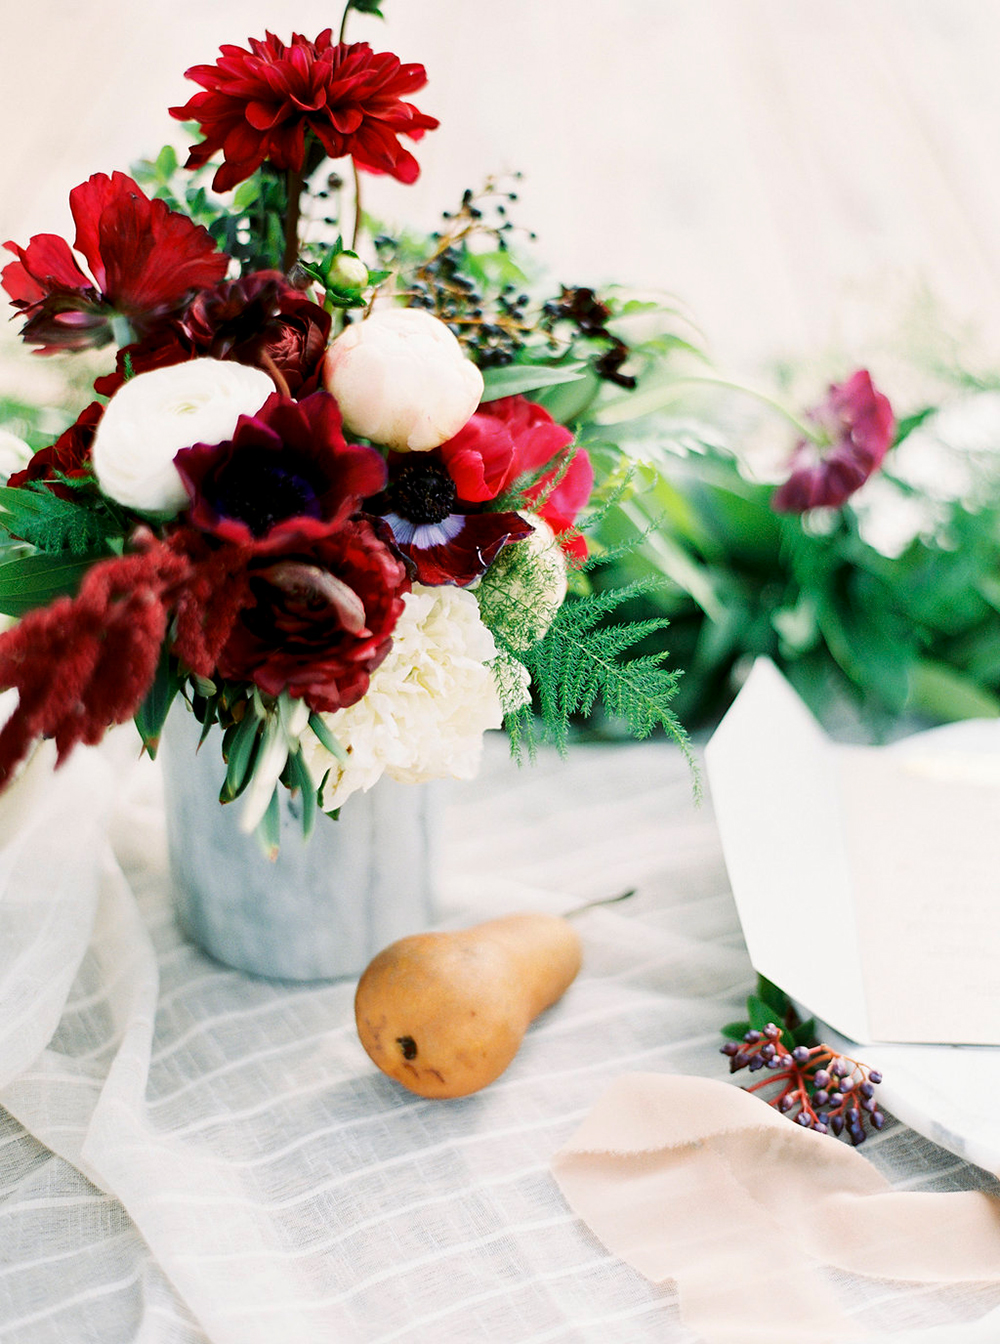 wedding decor - photo by Amanda Lenhardt https://ruffledblog.com/relaxed-san-juan-capistrano-wedding-inspiration